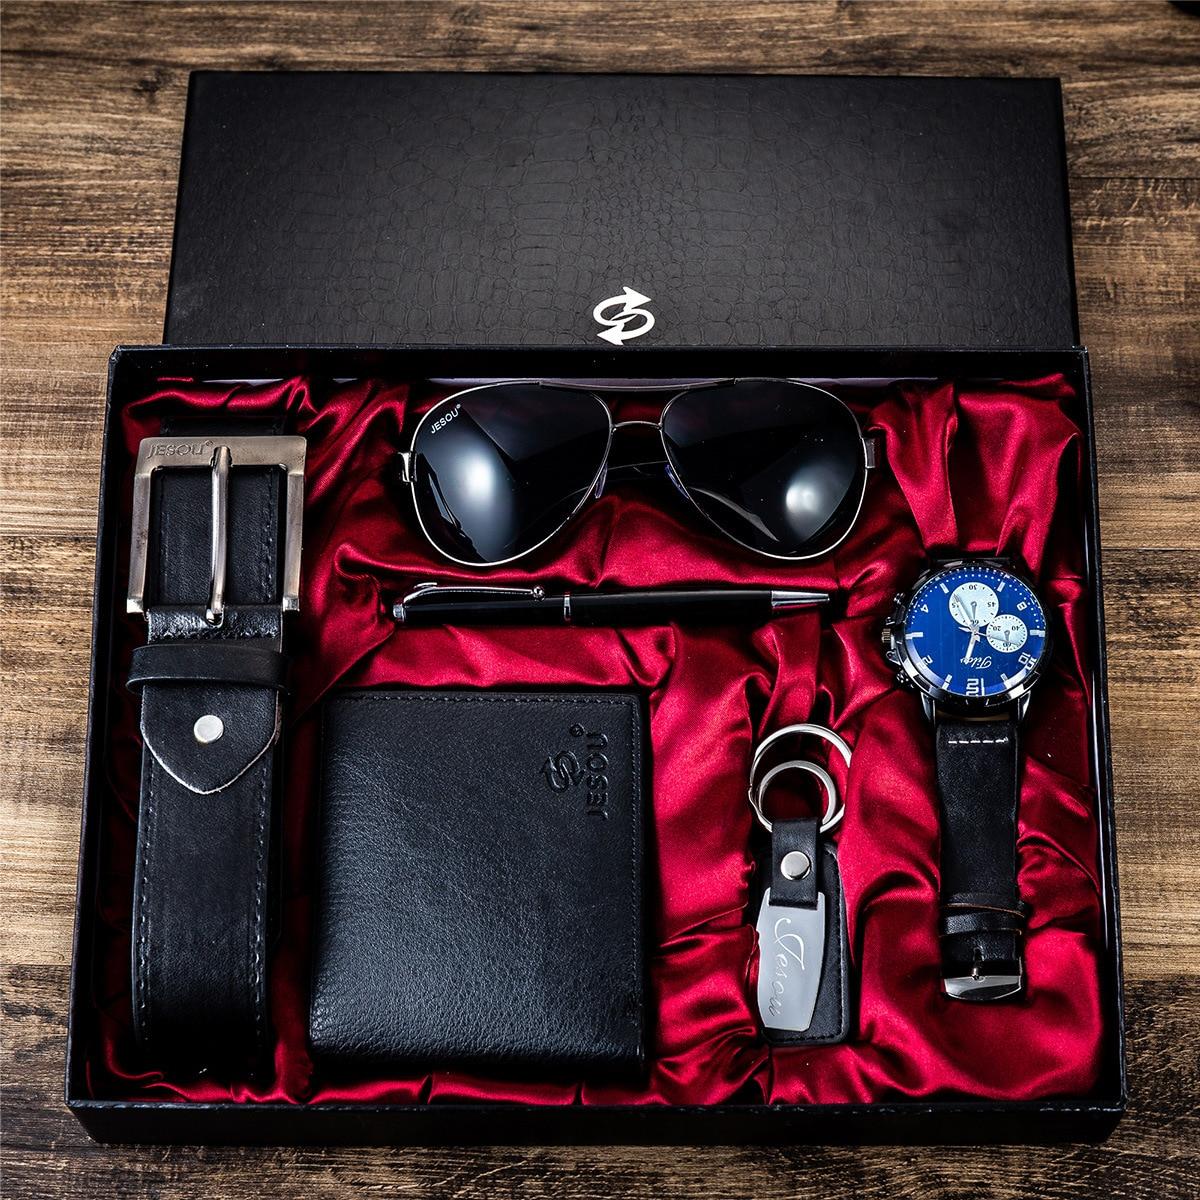 6pes/Set Men's Gift Set Beautifully Packaged Watch + Leather Belt Wallet Creative Minimalist Combination Set-6pes/Set